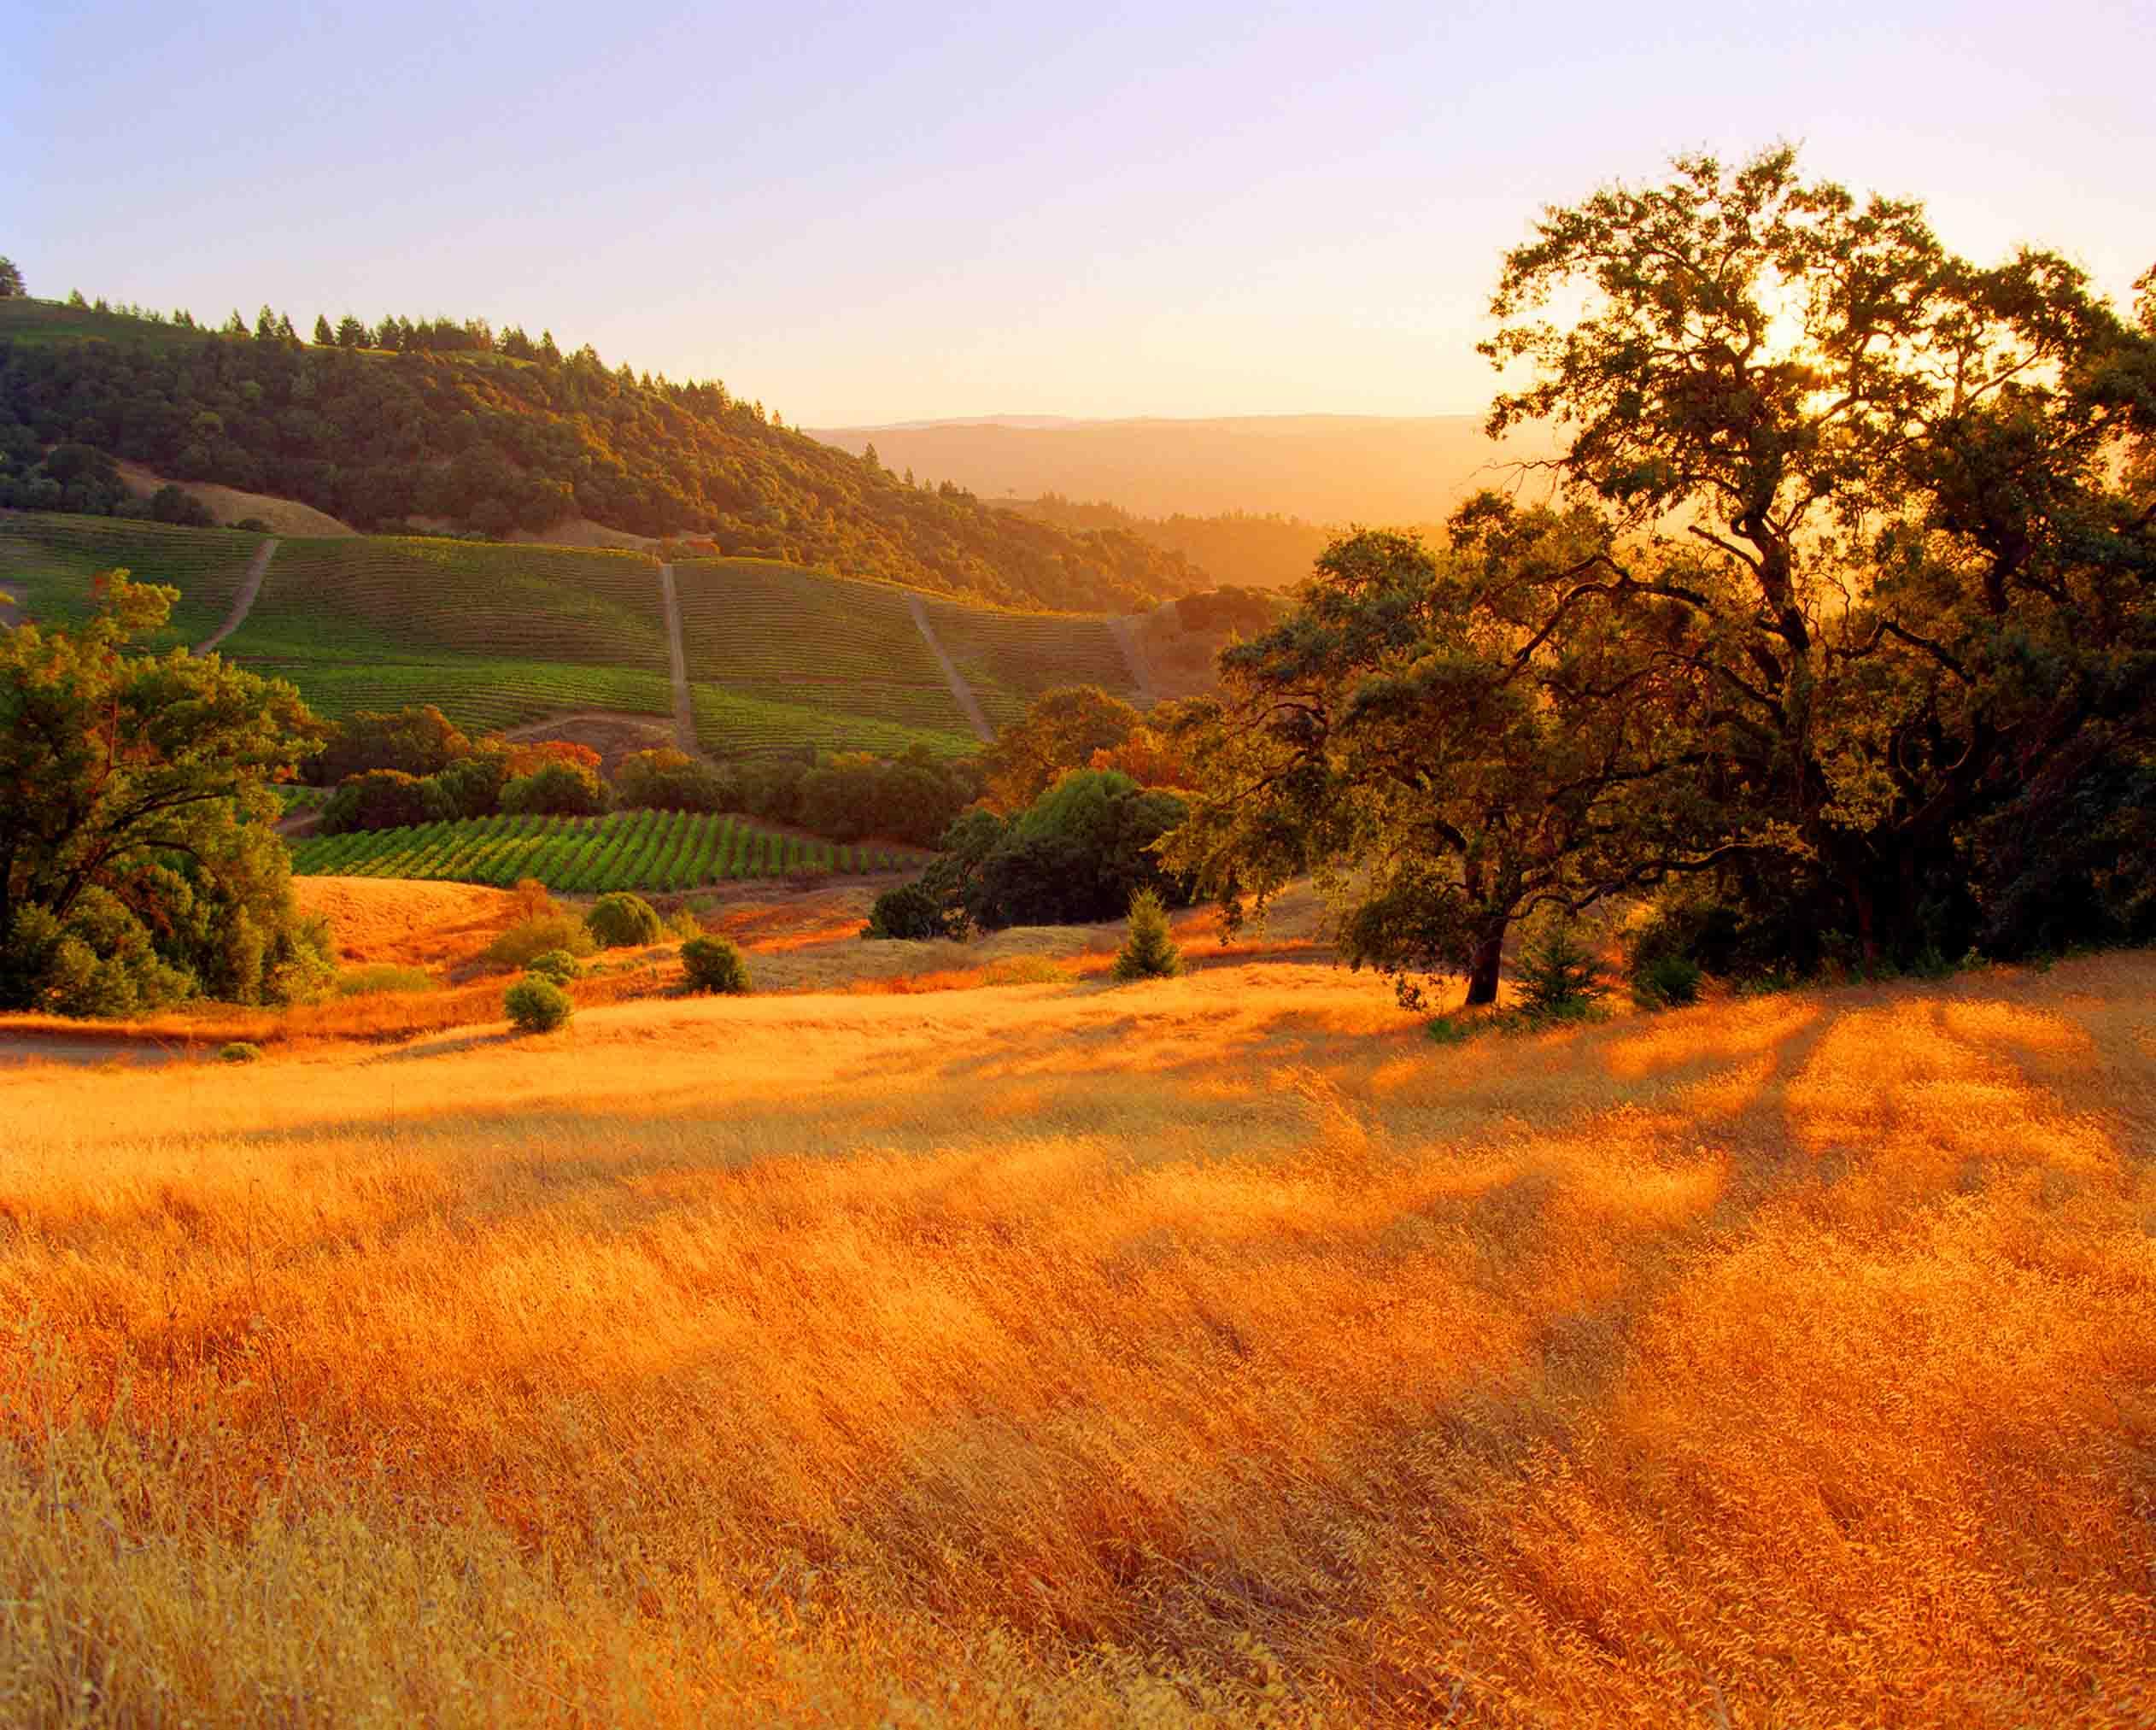 Sonoma County, California vineyard 2